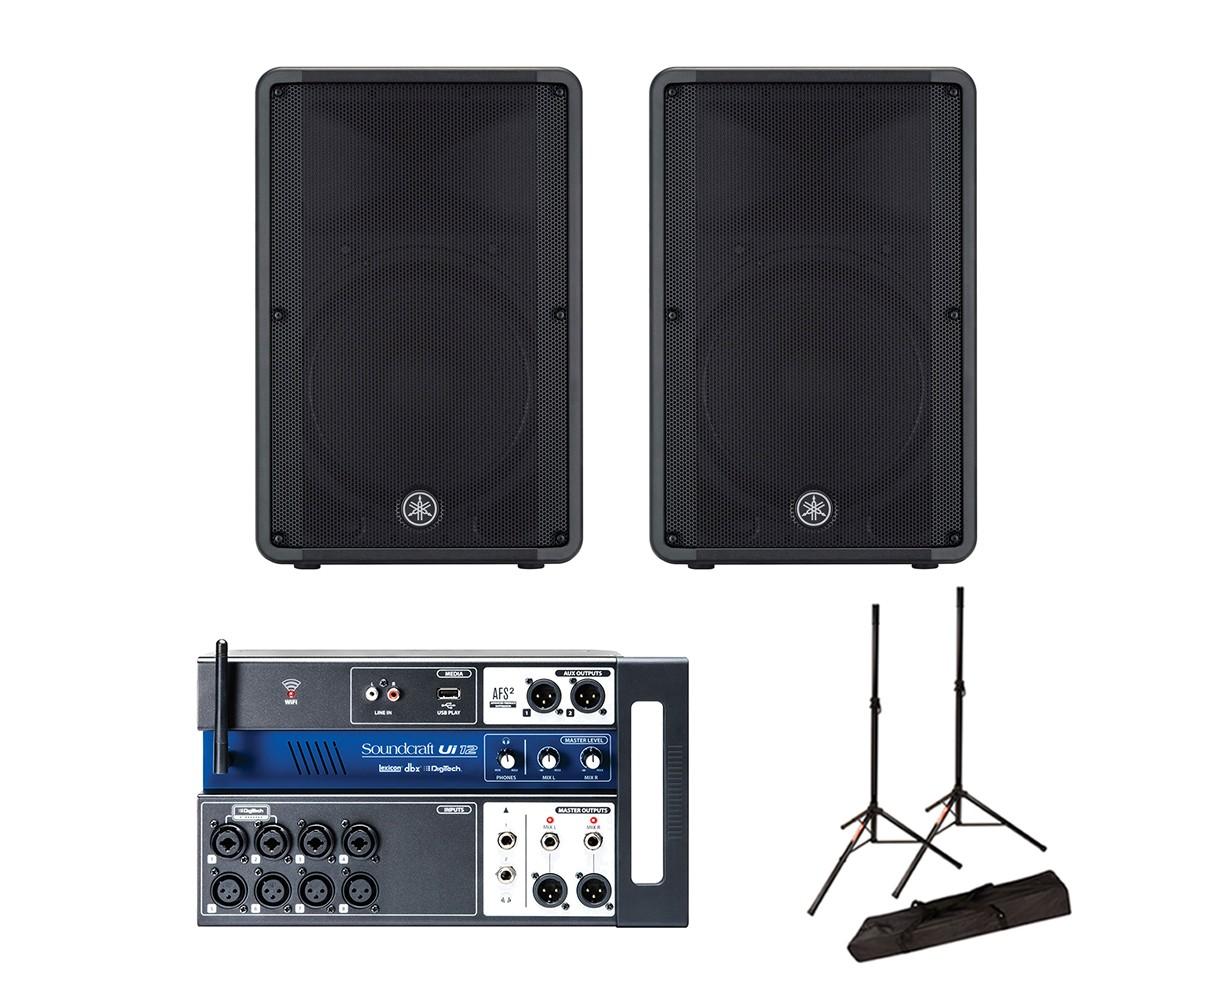 2x Yamaha DBR15 + Soundcraft Ui12 + Stands w/ Bag